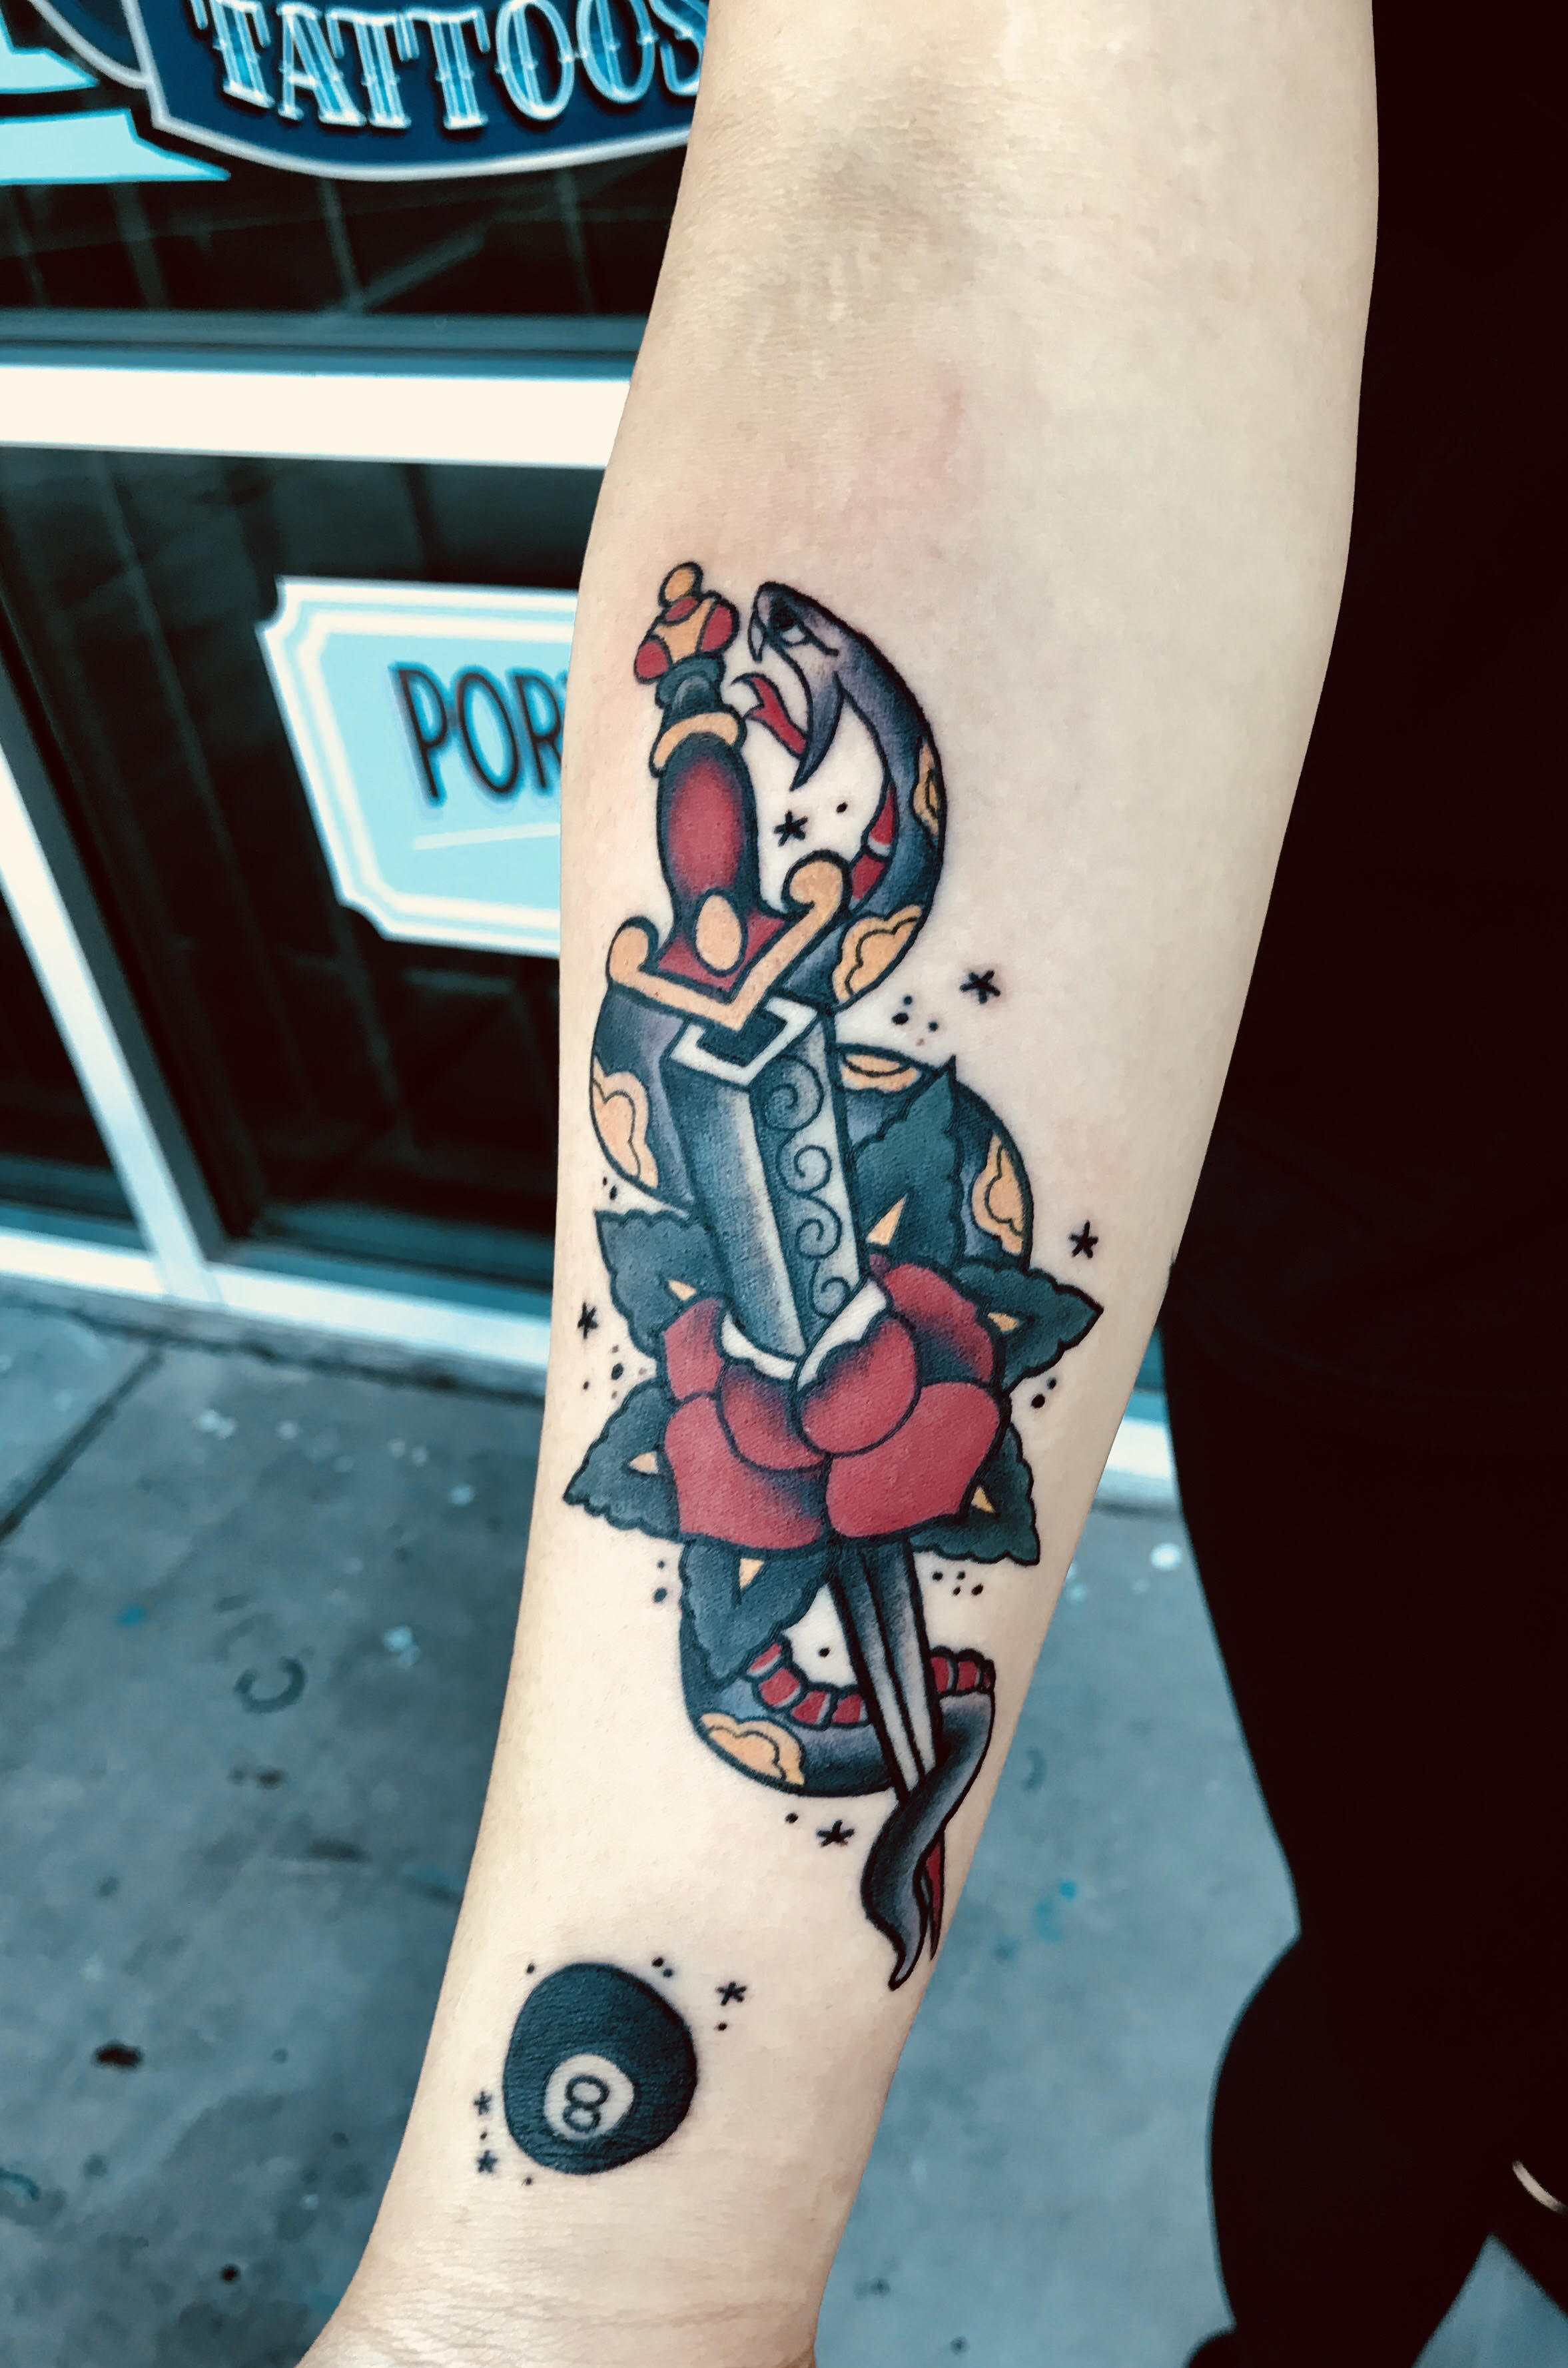 Traditional Tattoo by Krystof